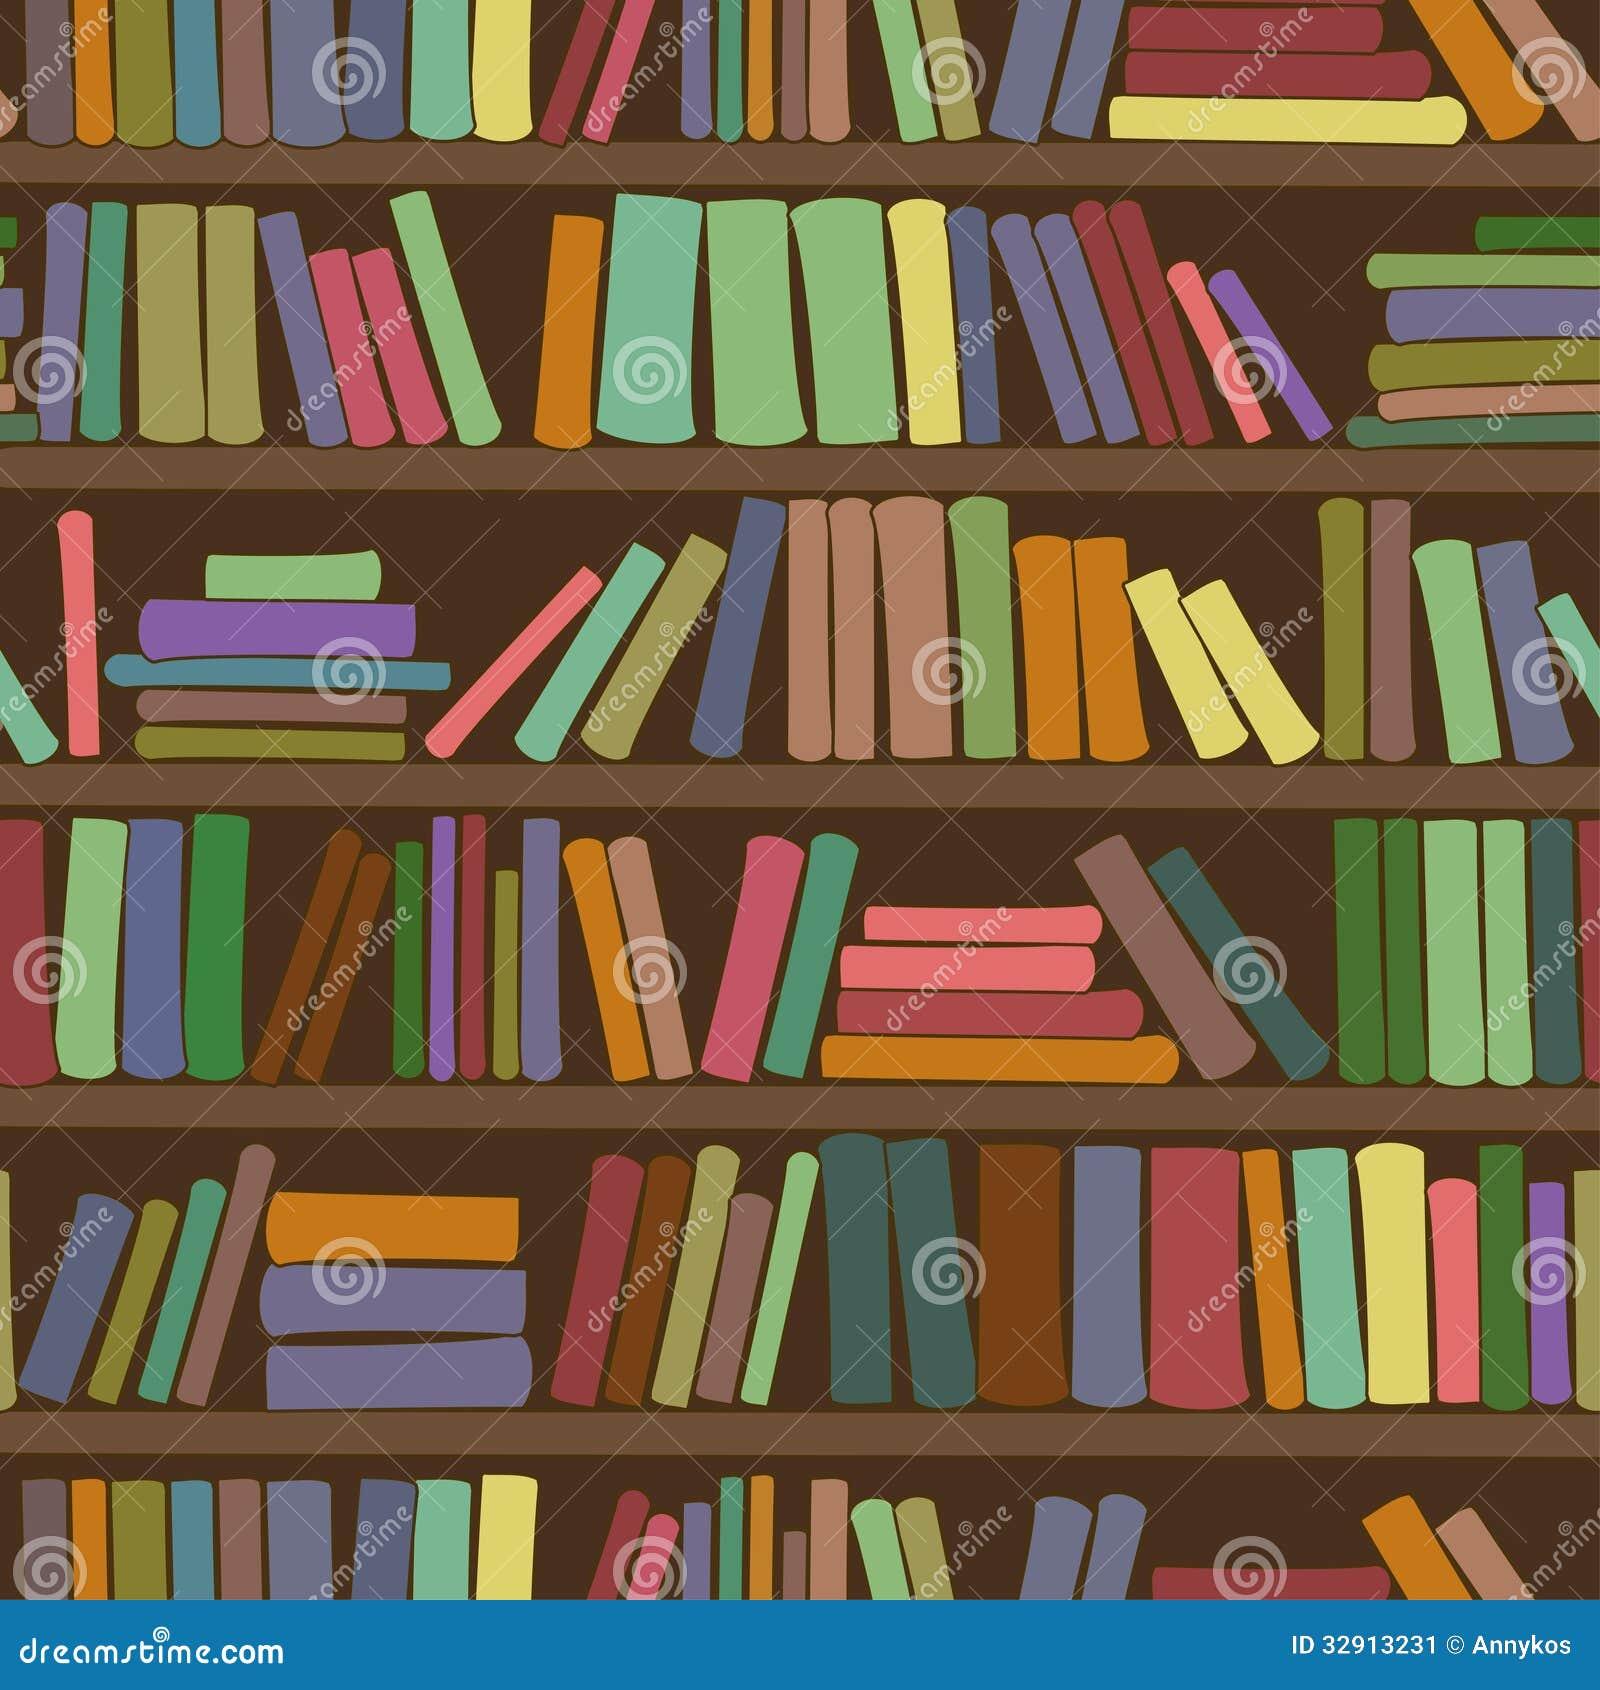 Seamless Pattern Of Bookshelf With Books Stock Vector ...